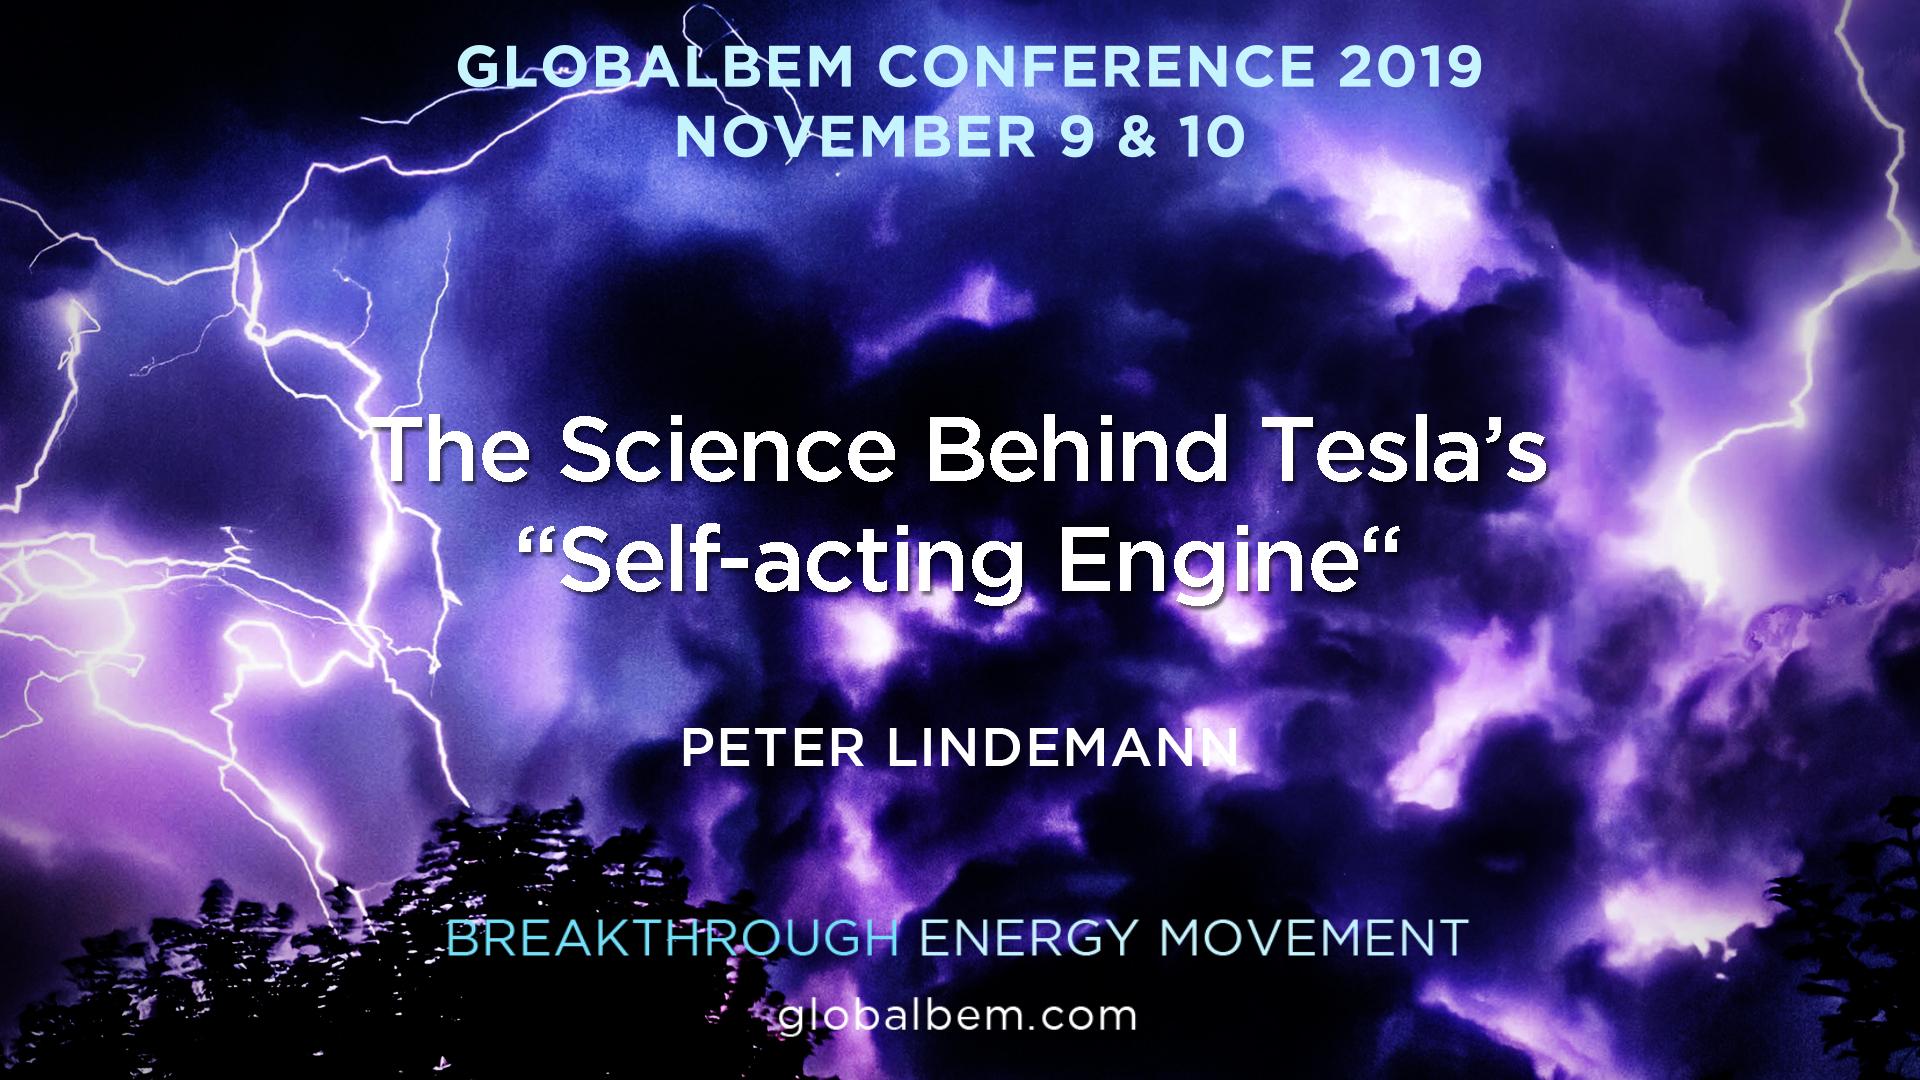 https://globalbem.com/wp-content/uploads/2019/11/BEM19-Peter-Lindemann.jpg